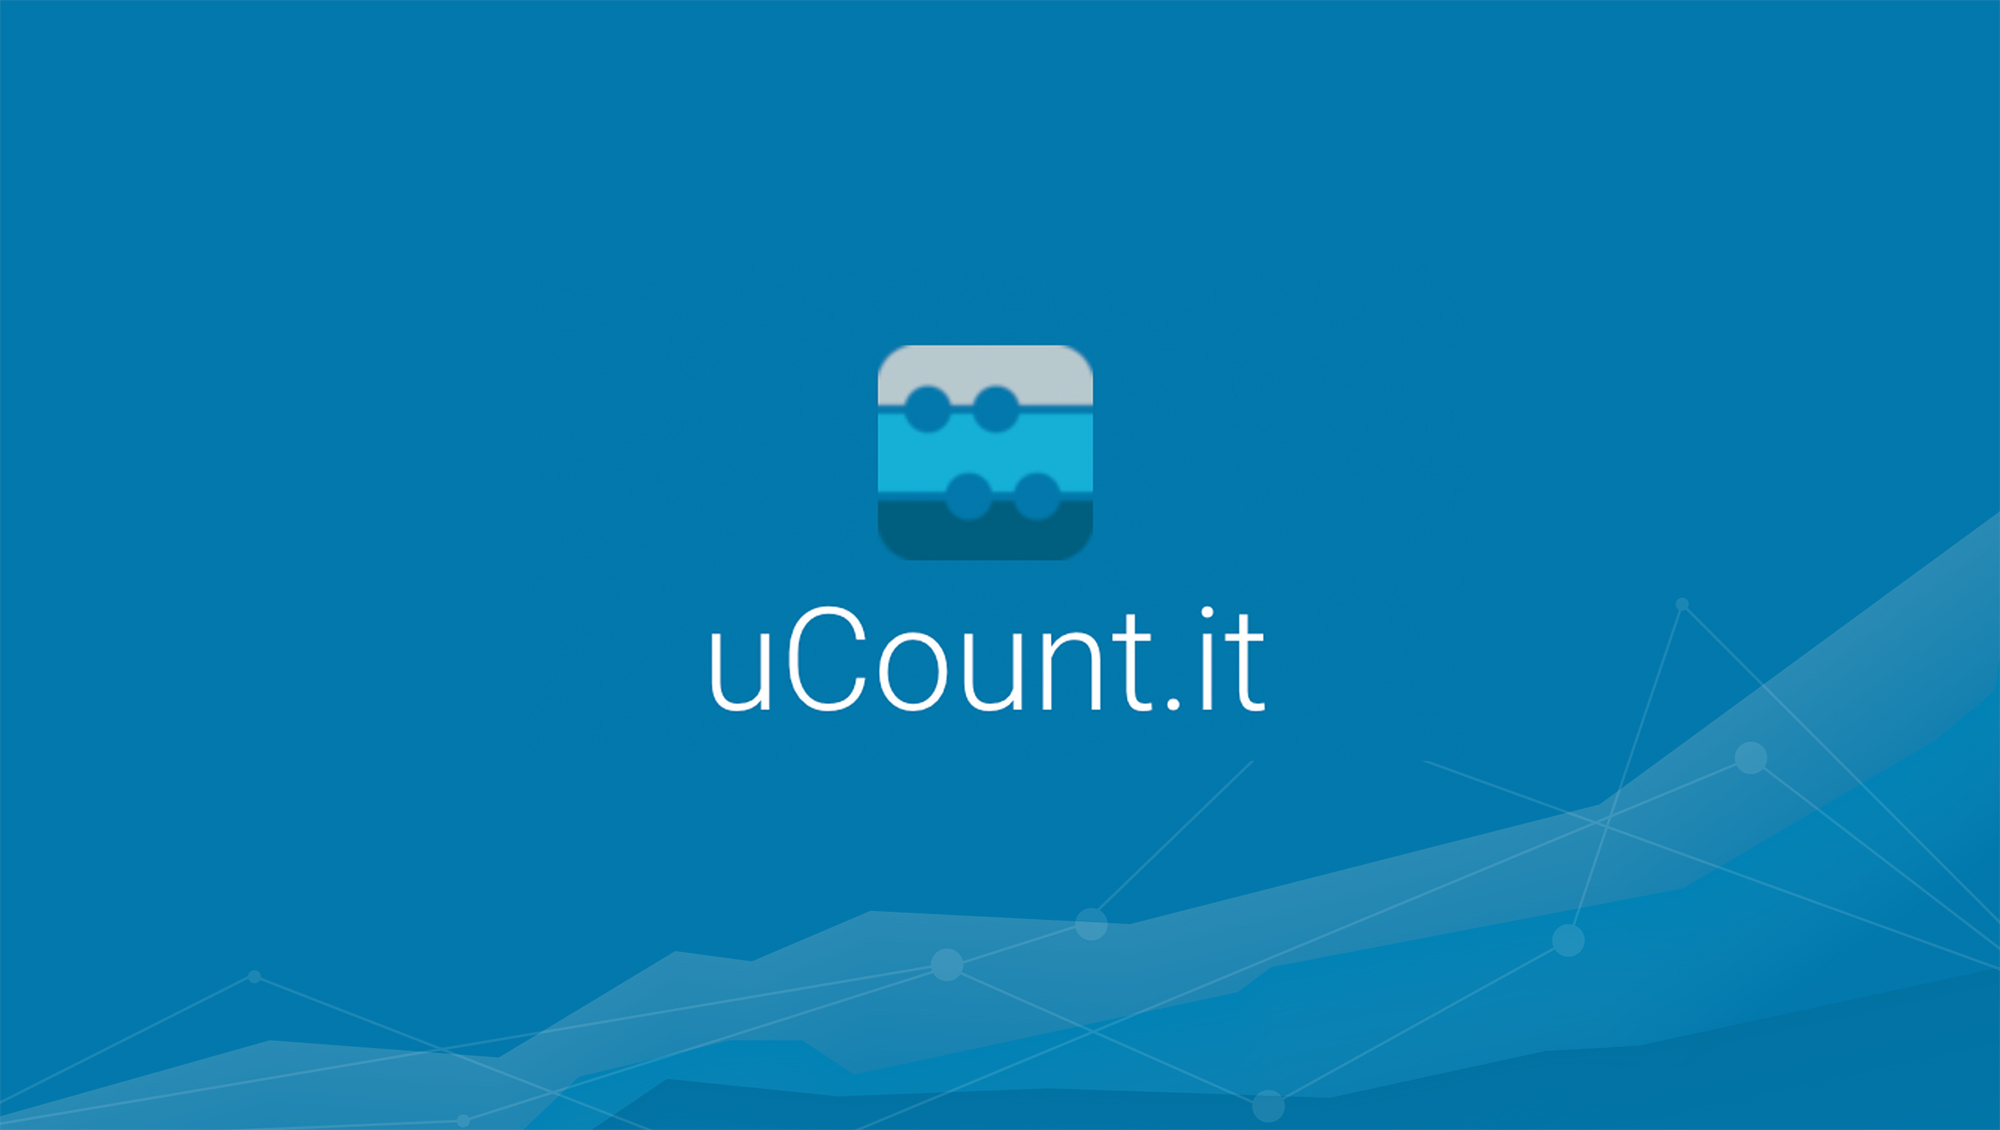 VCA Technology - uCount.it